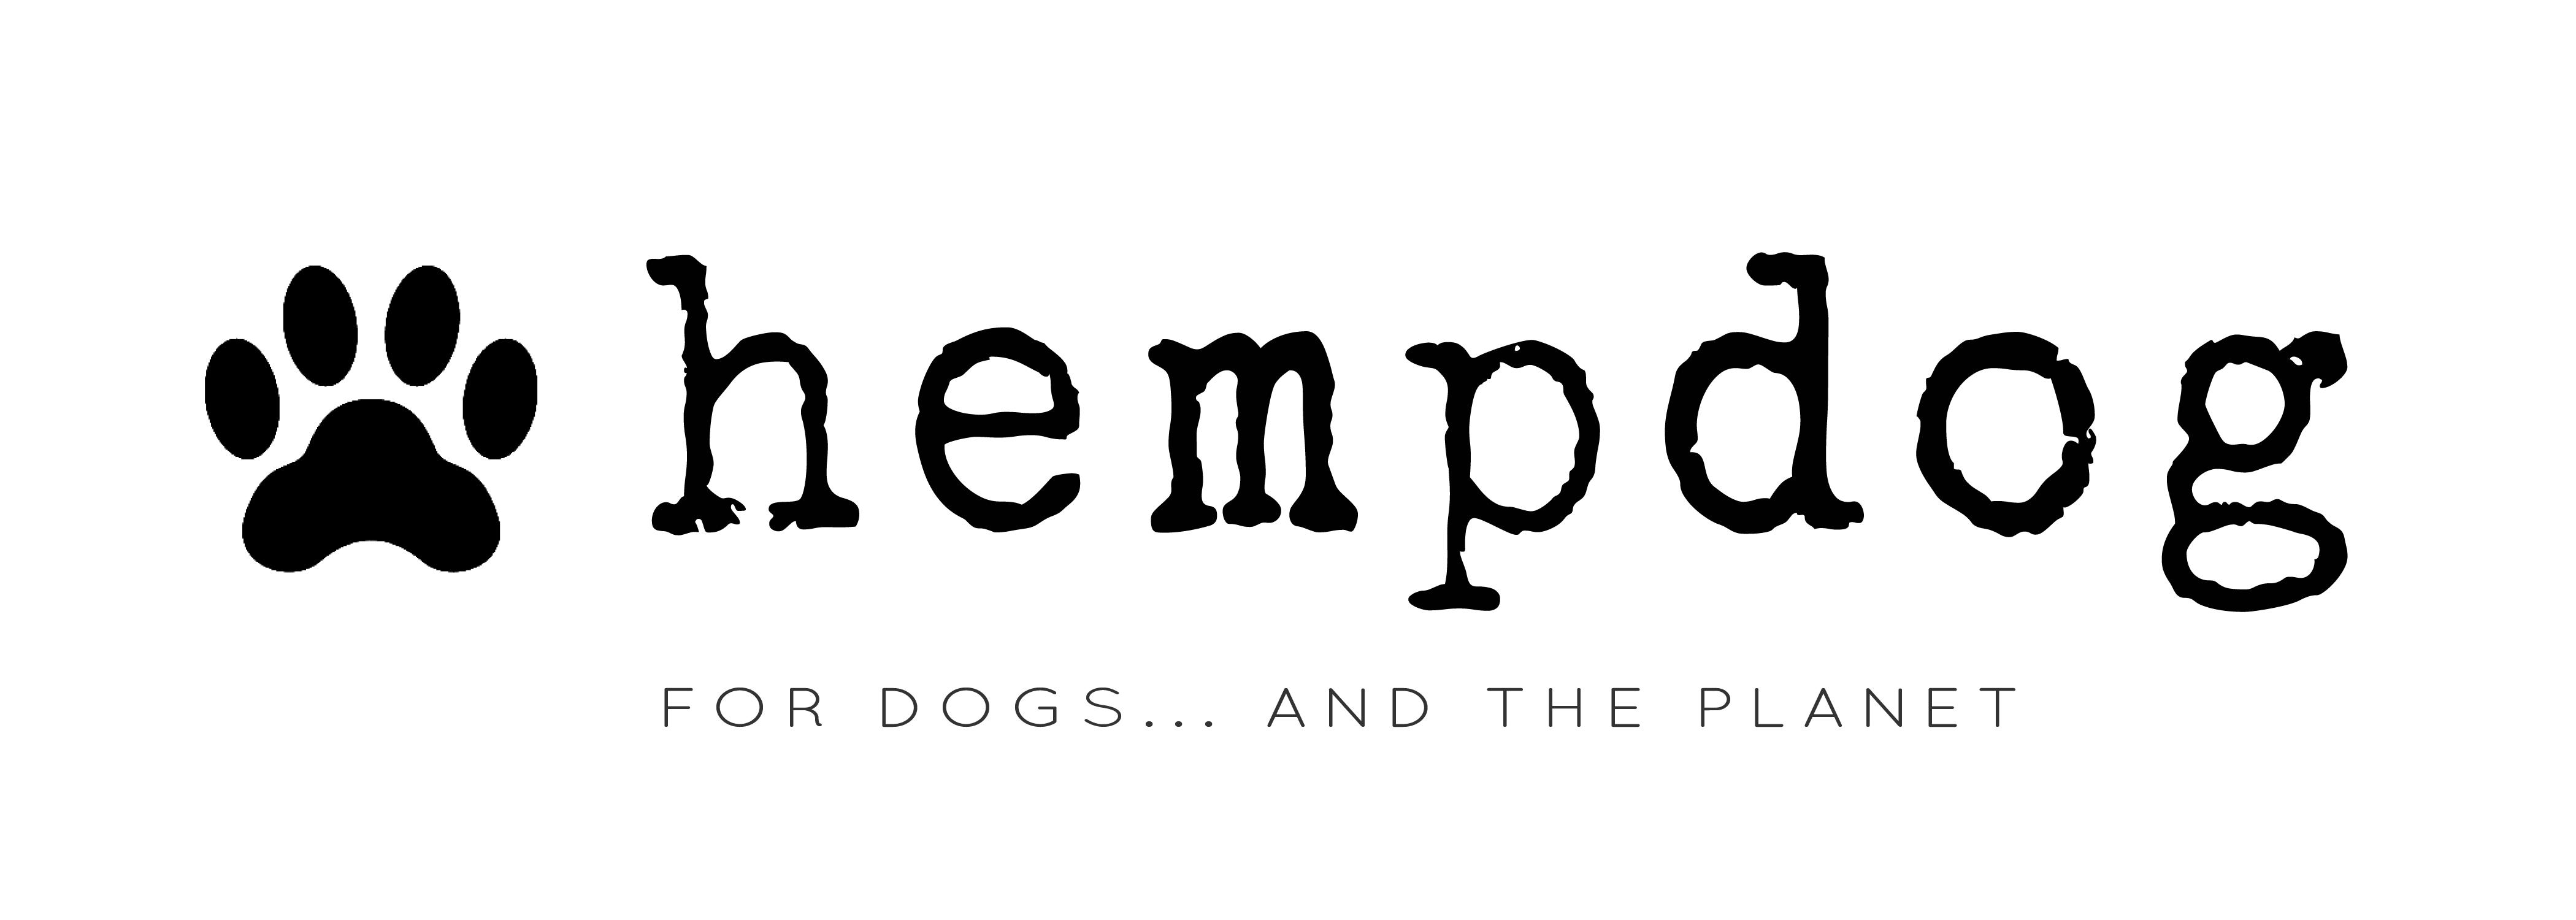 Hemp-Dog Final